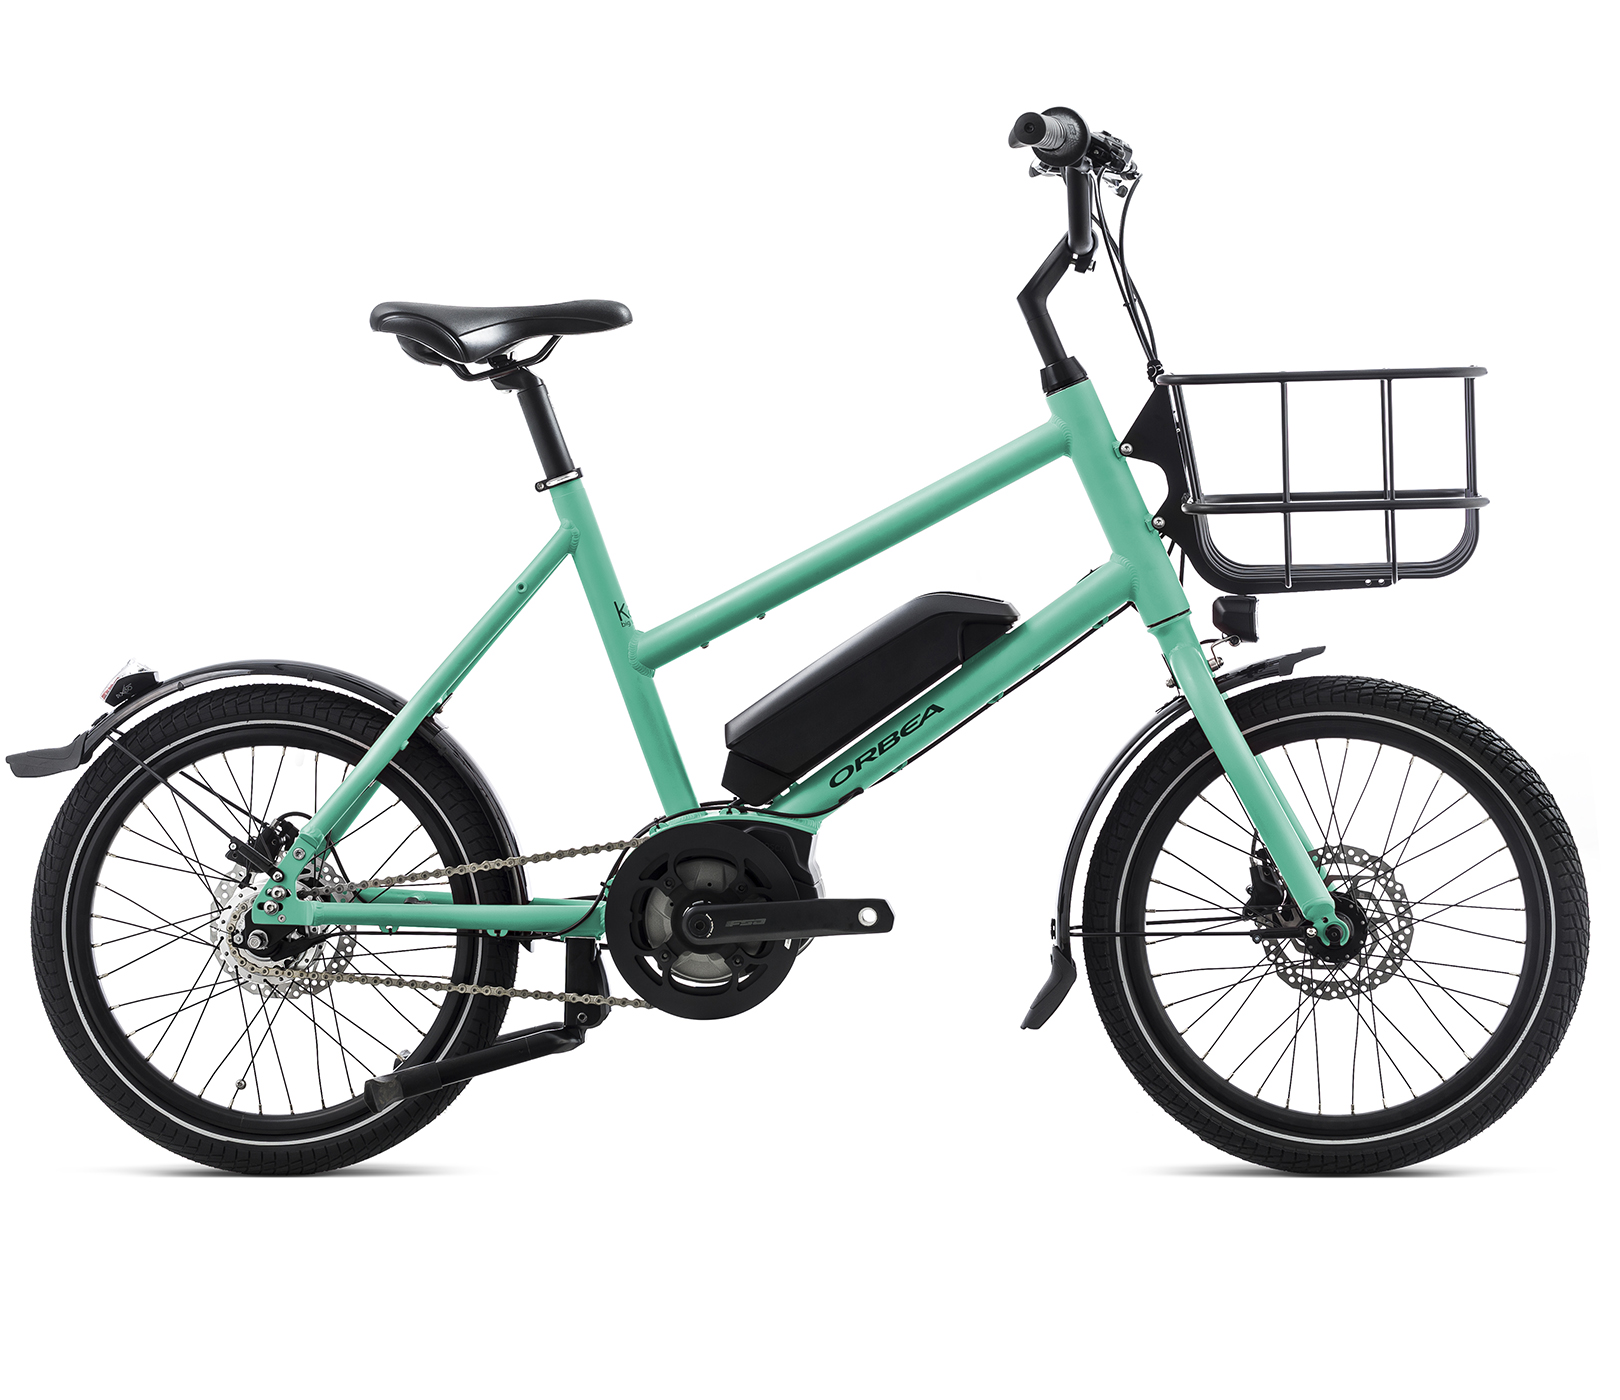 85a9a8af29e Orbea Katu-E 30 2019 Electric Urban Bike - Fresh Green £1,899.00